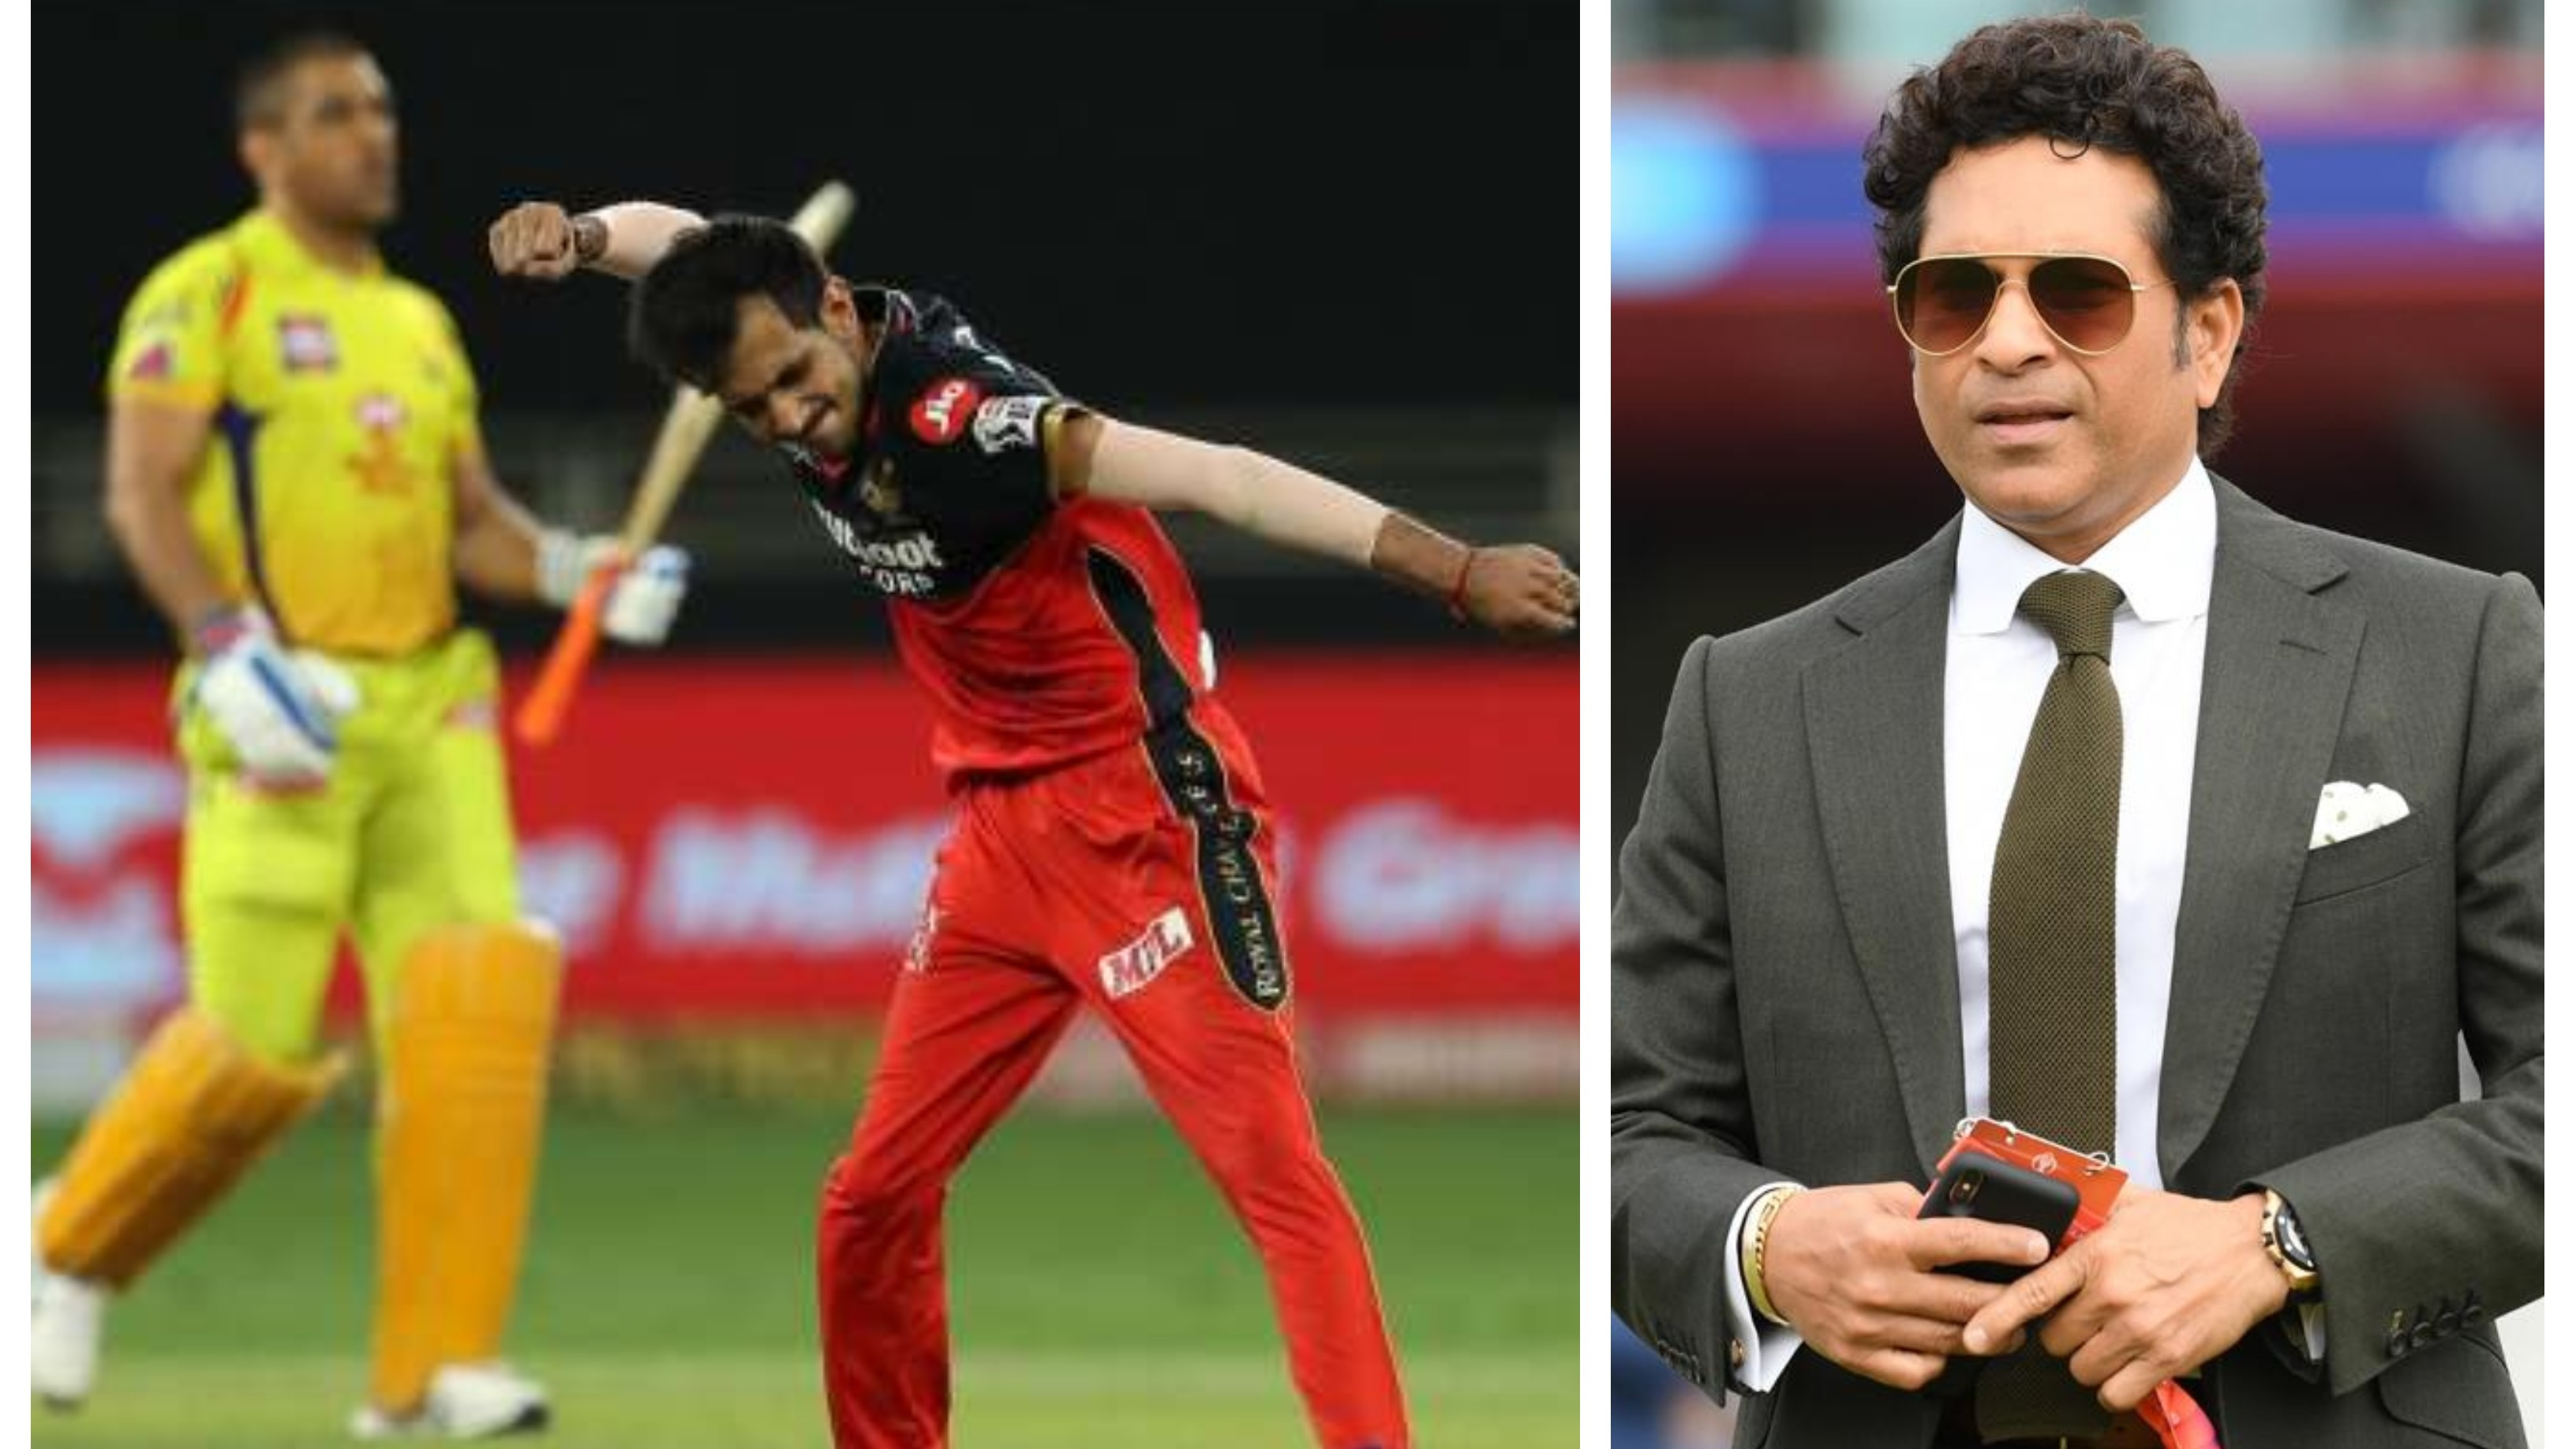 IPL 2020: 'Chahal was playing chess with Dhoni', Tendulkar explains CSK skipper's dismissal